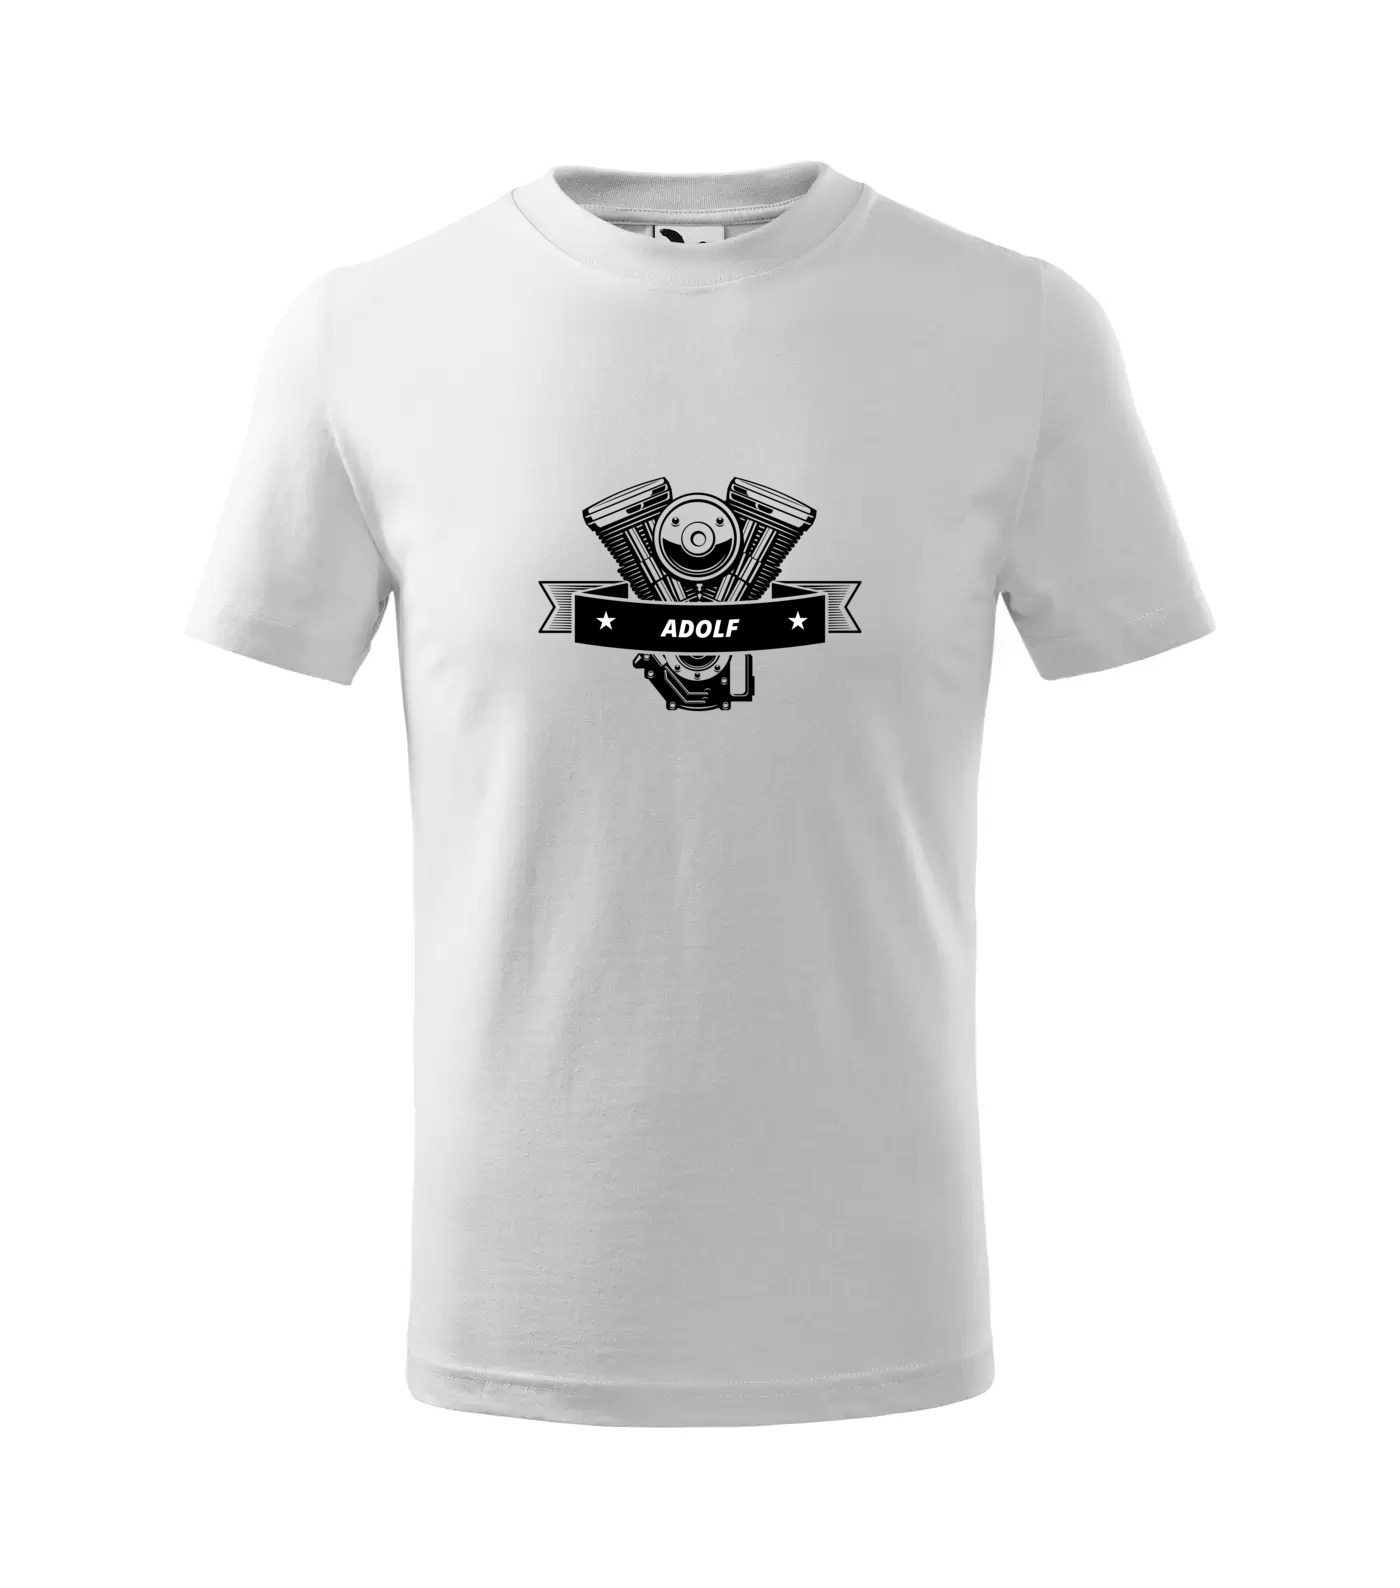 Tričko Motorkář Adolf